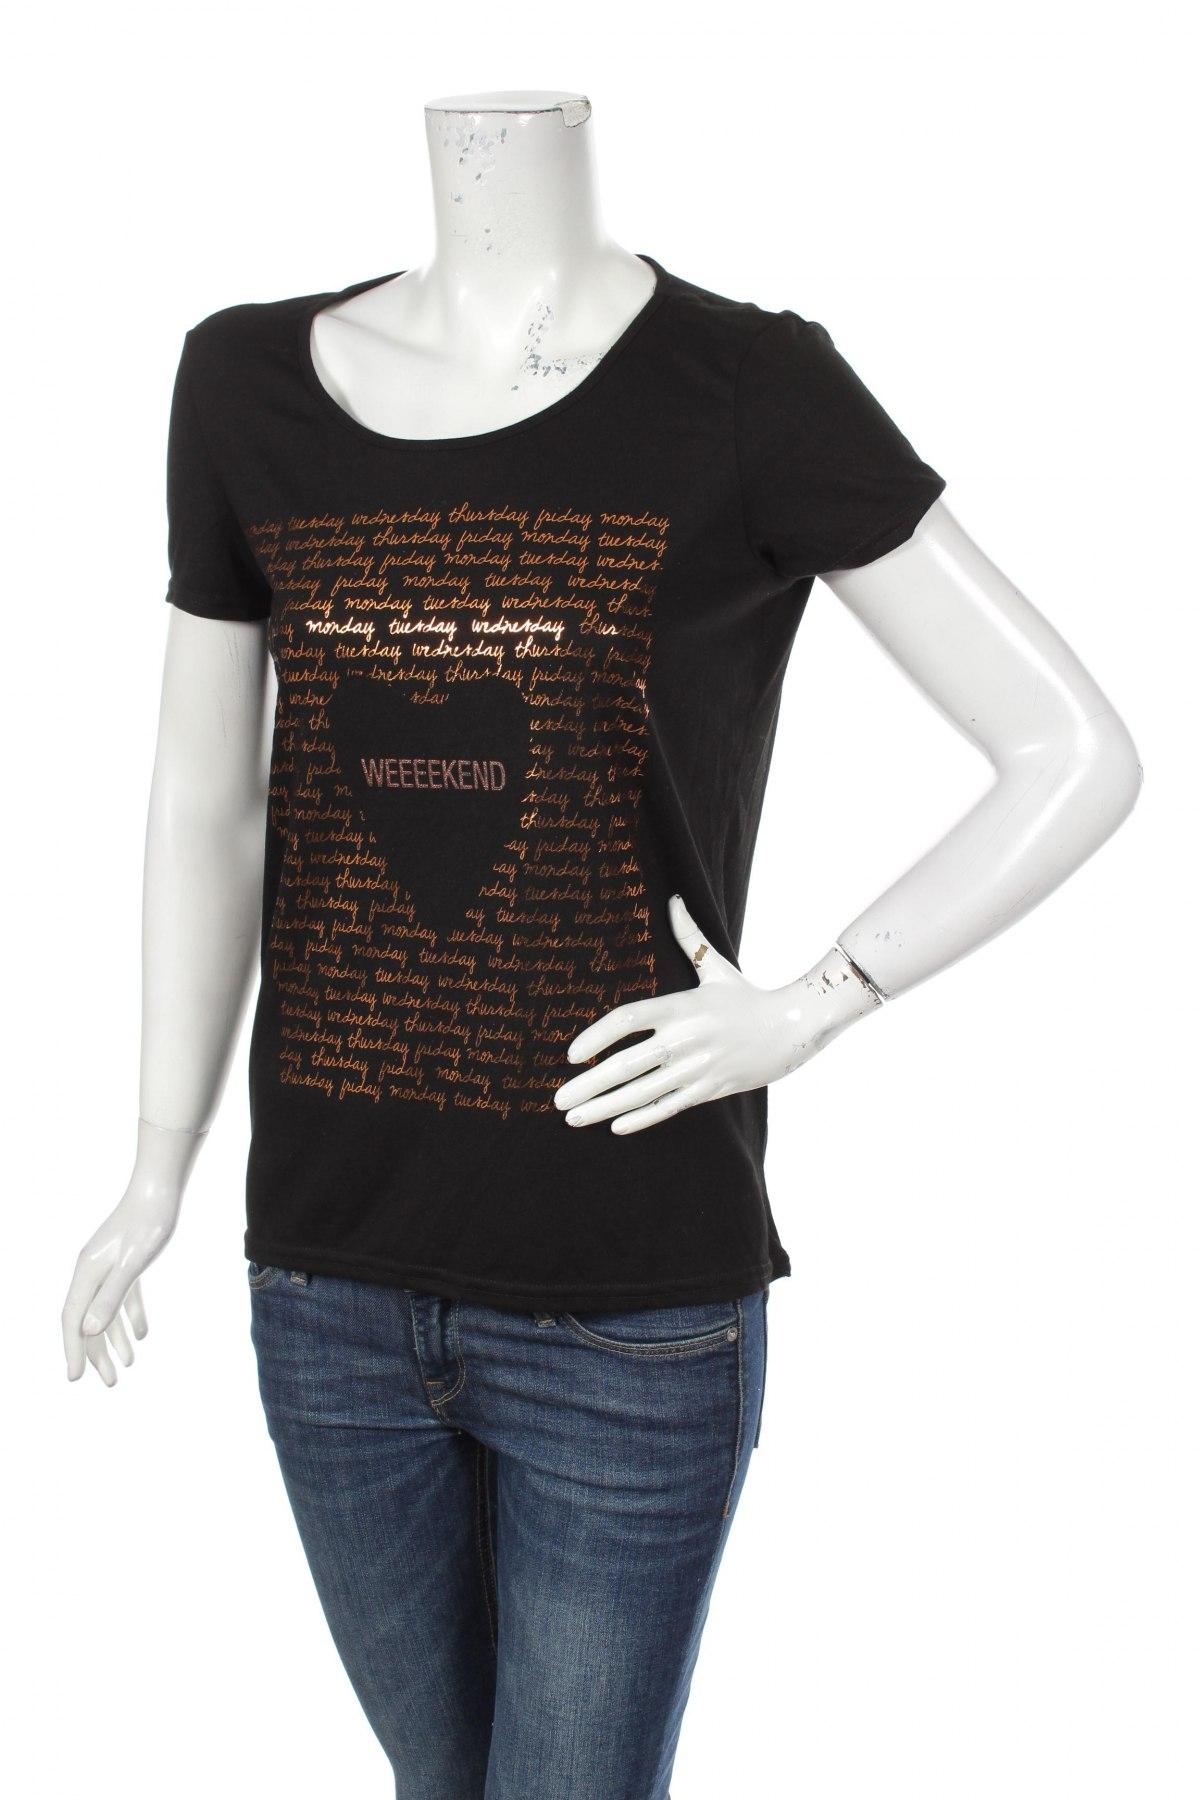 358aca8b29 Γυναικείο t-shirt Montego - σε συμφέρουσα τιμή στο Remix -  100100453